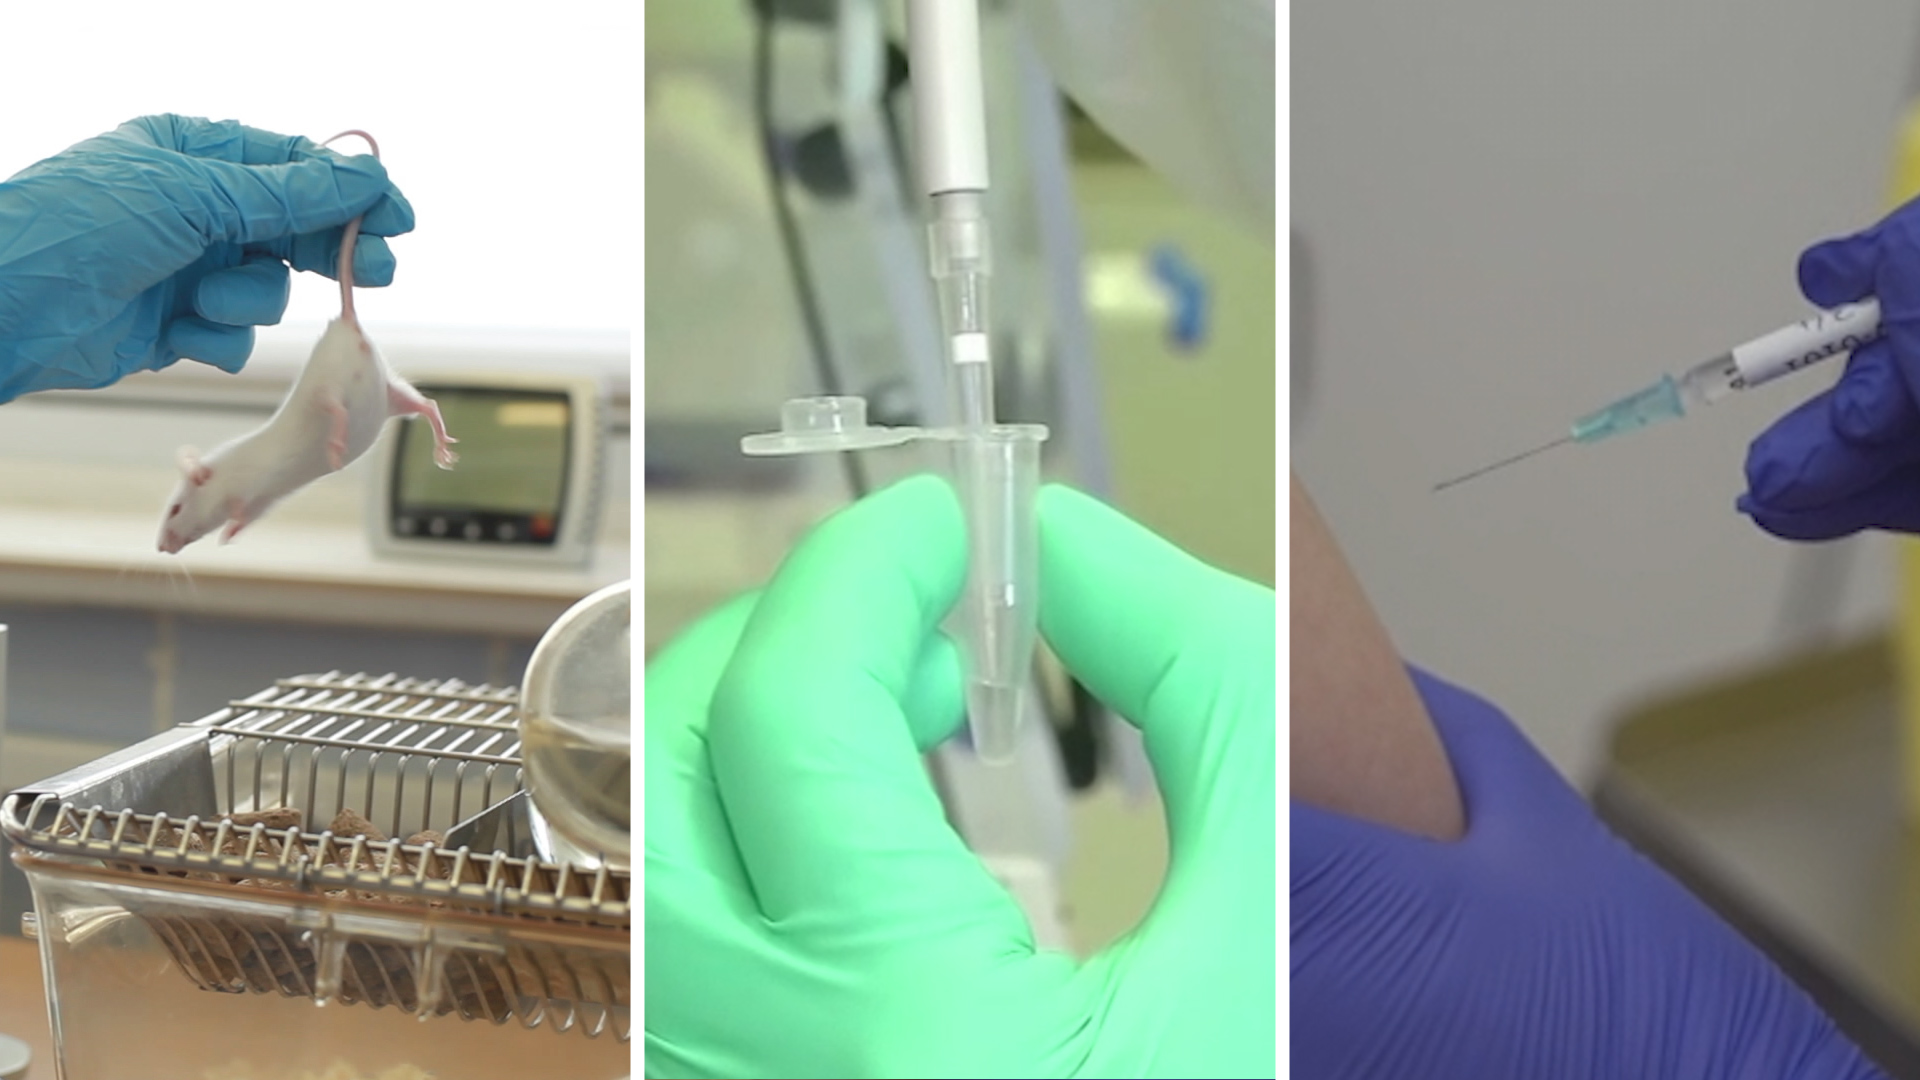 Pfizer coronavirus vaccine 95% effective, company says - The Washington Post